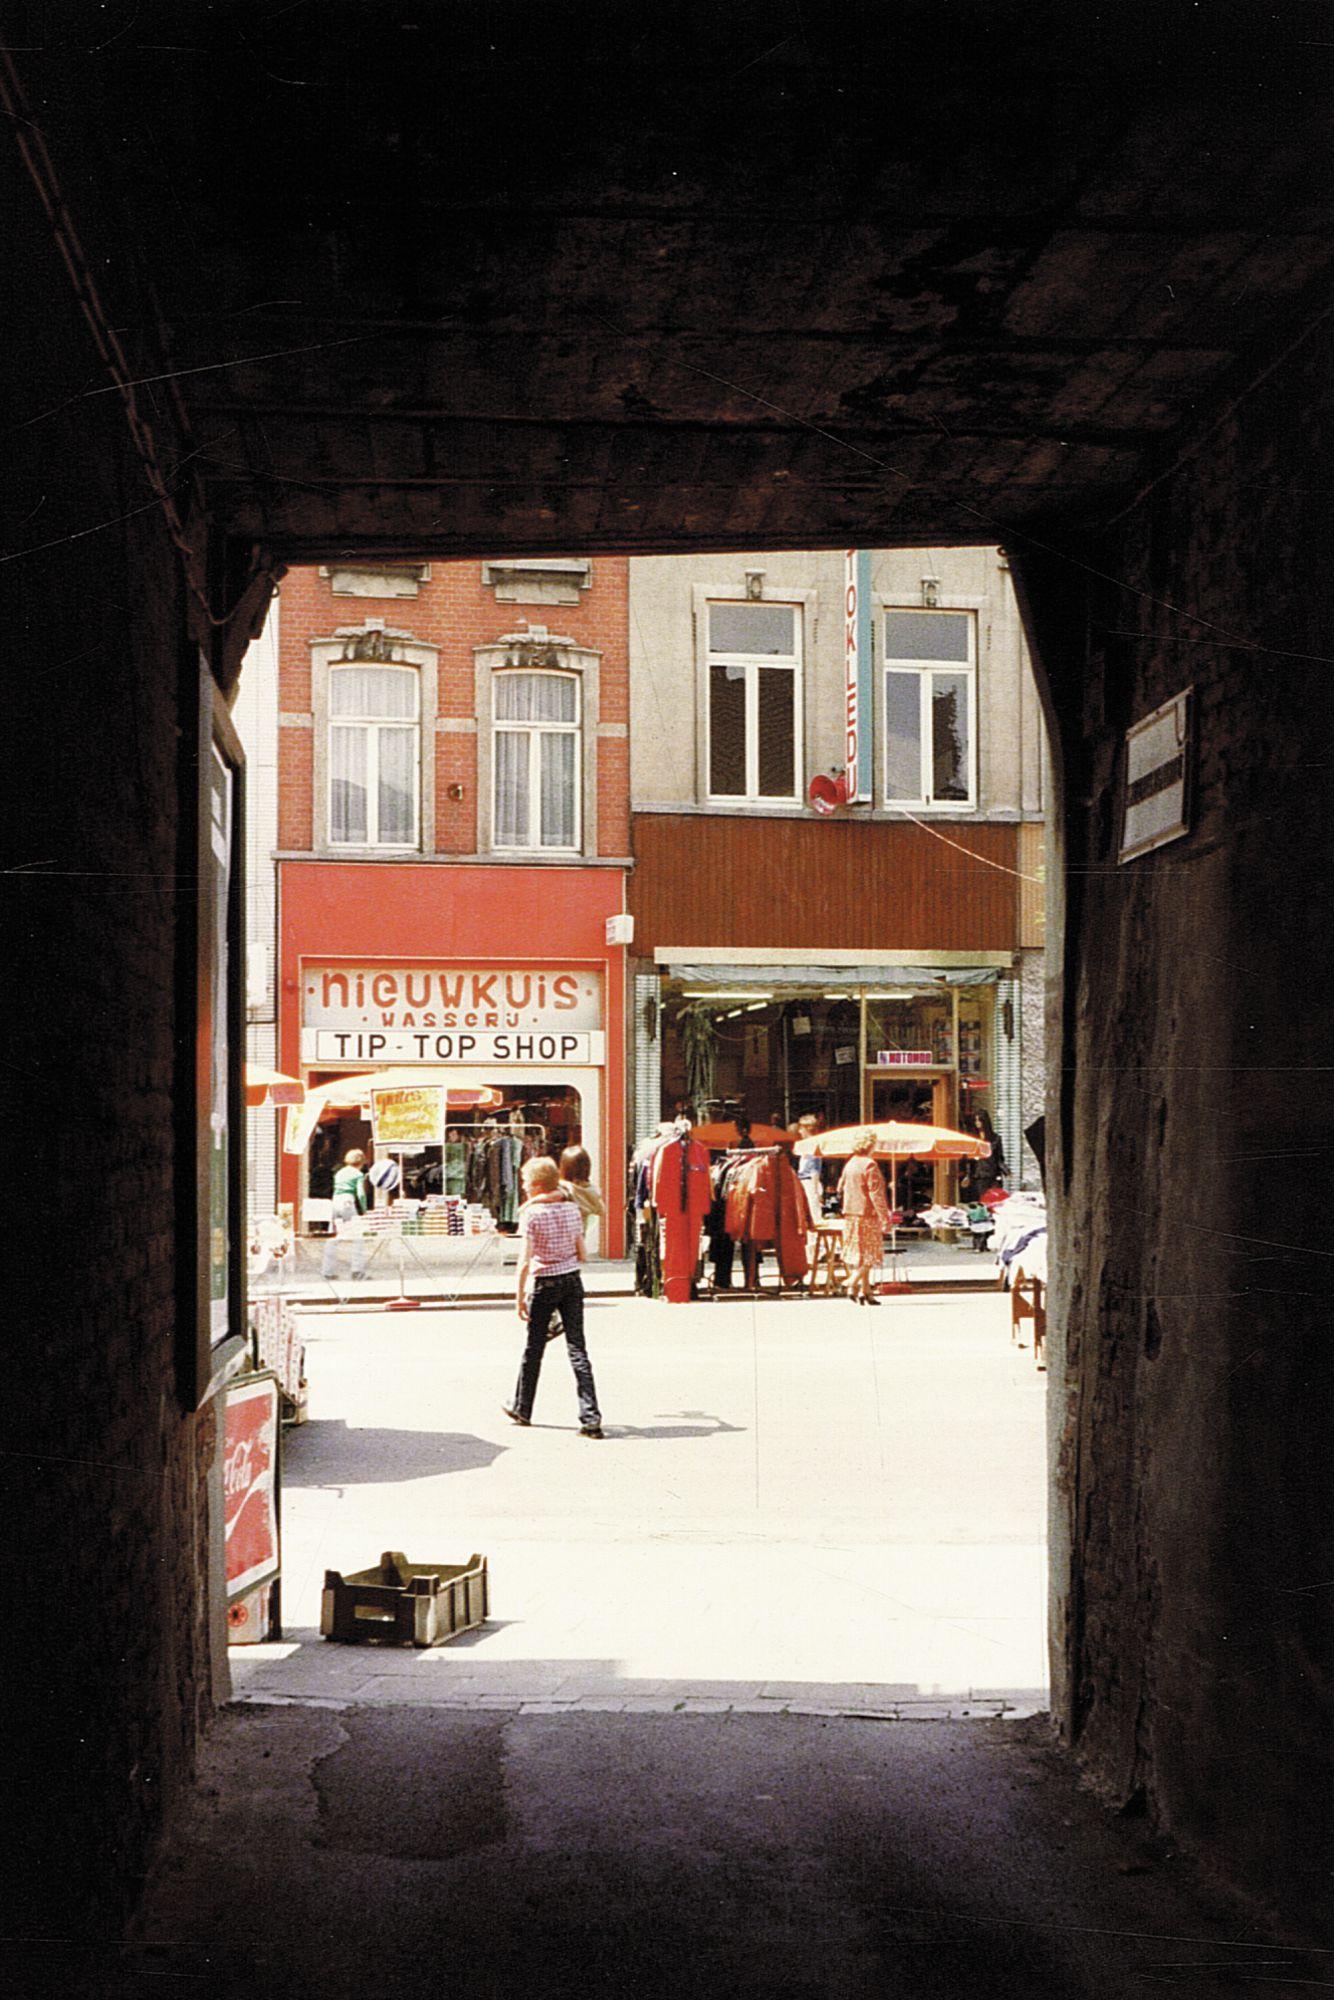 Amsterdamspoortje